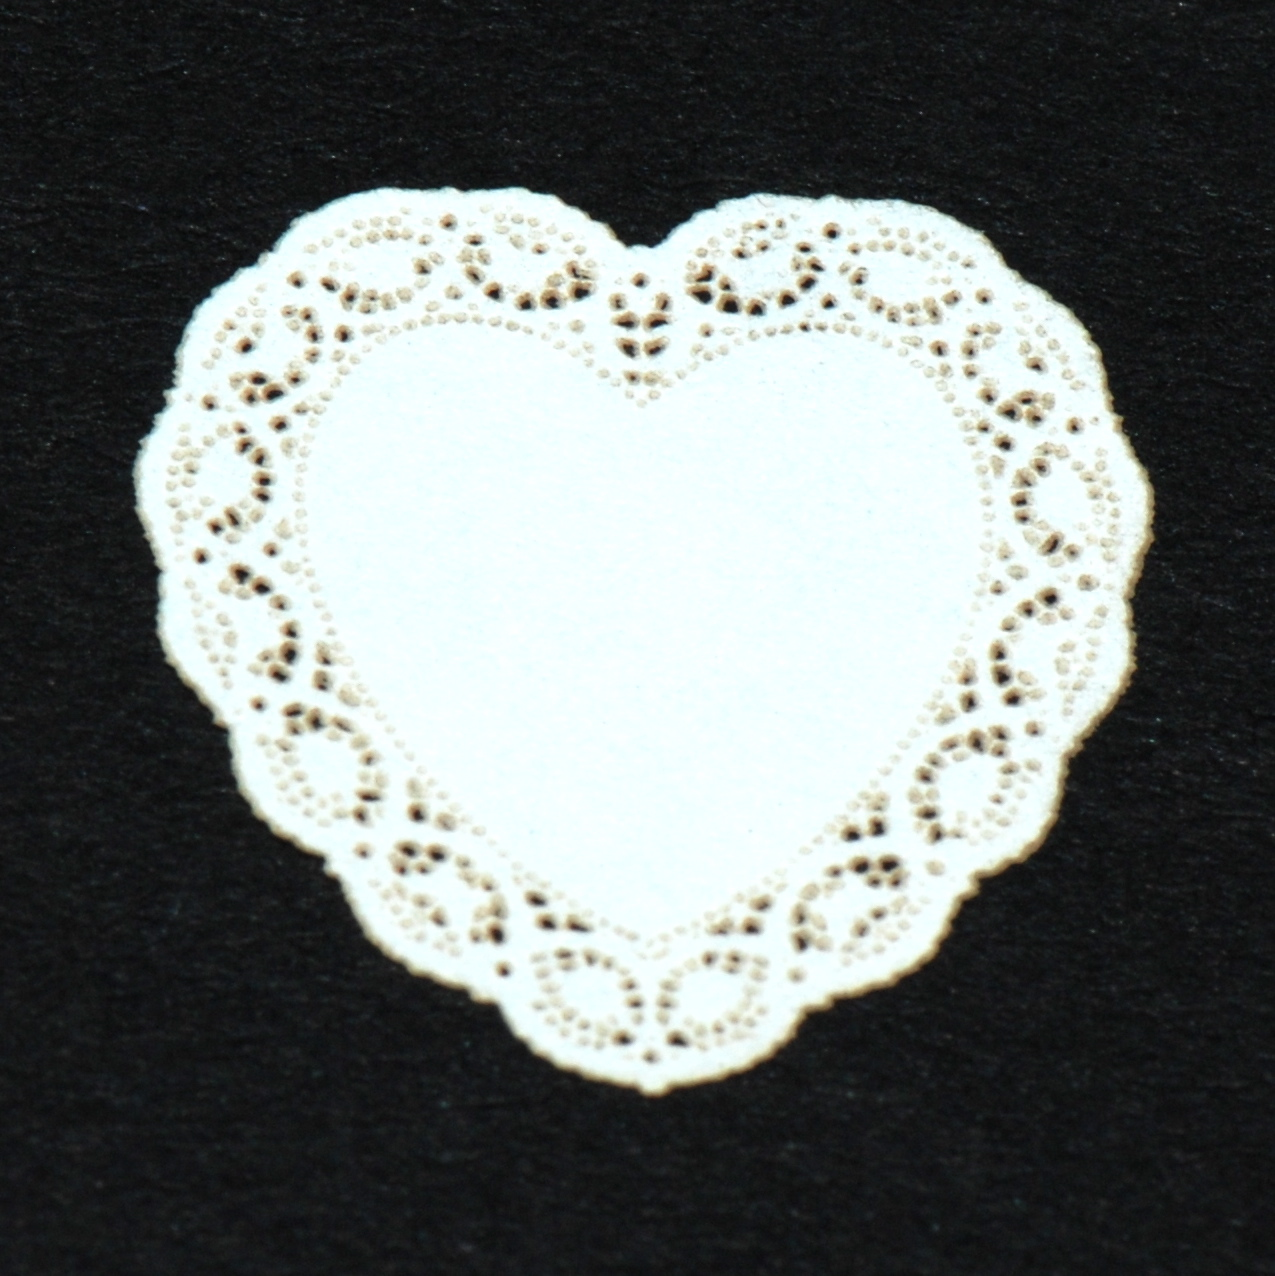 Heart Miniature Lace Doily 26 Stewart Dollhouse Creations